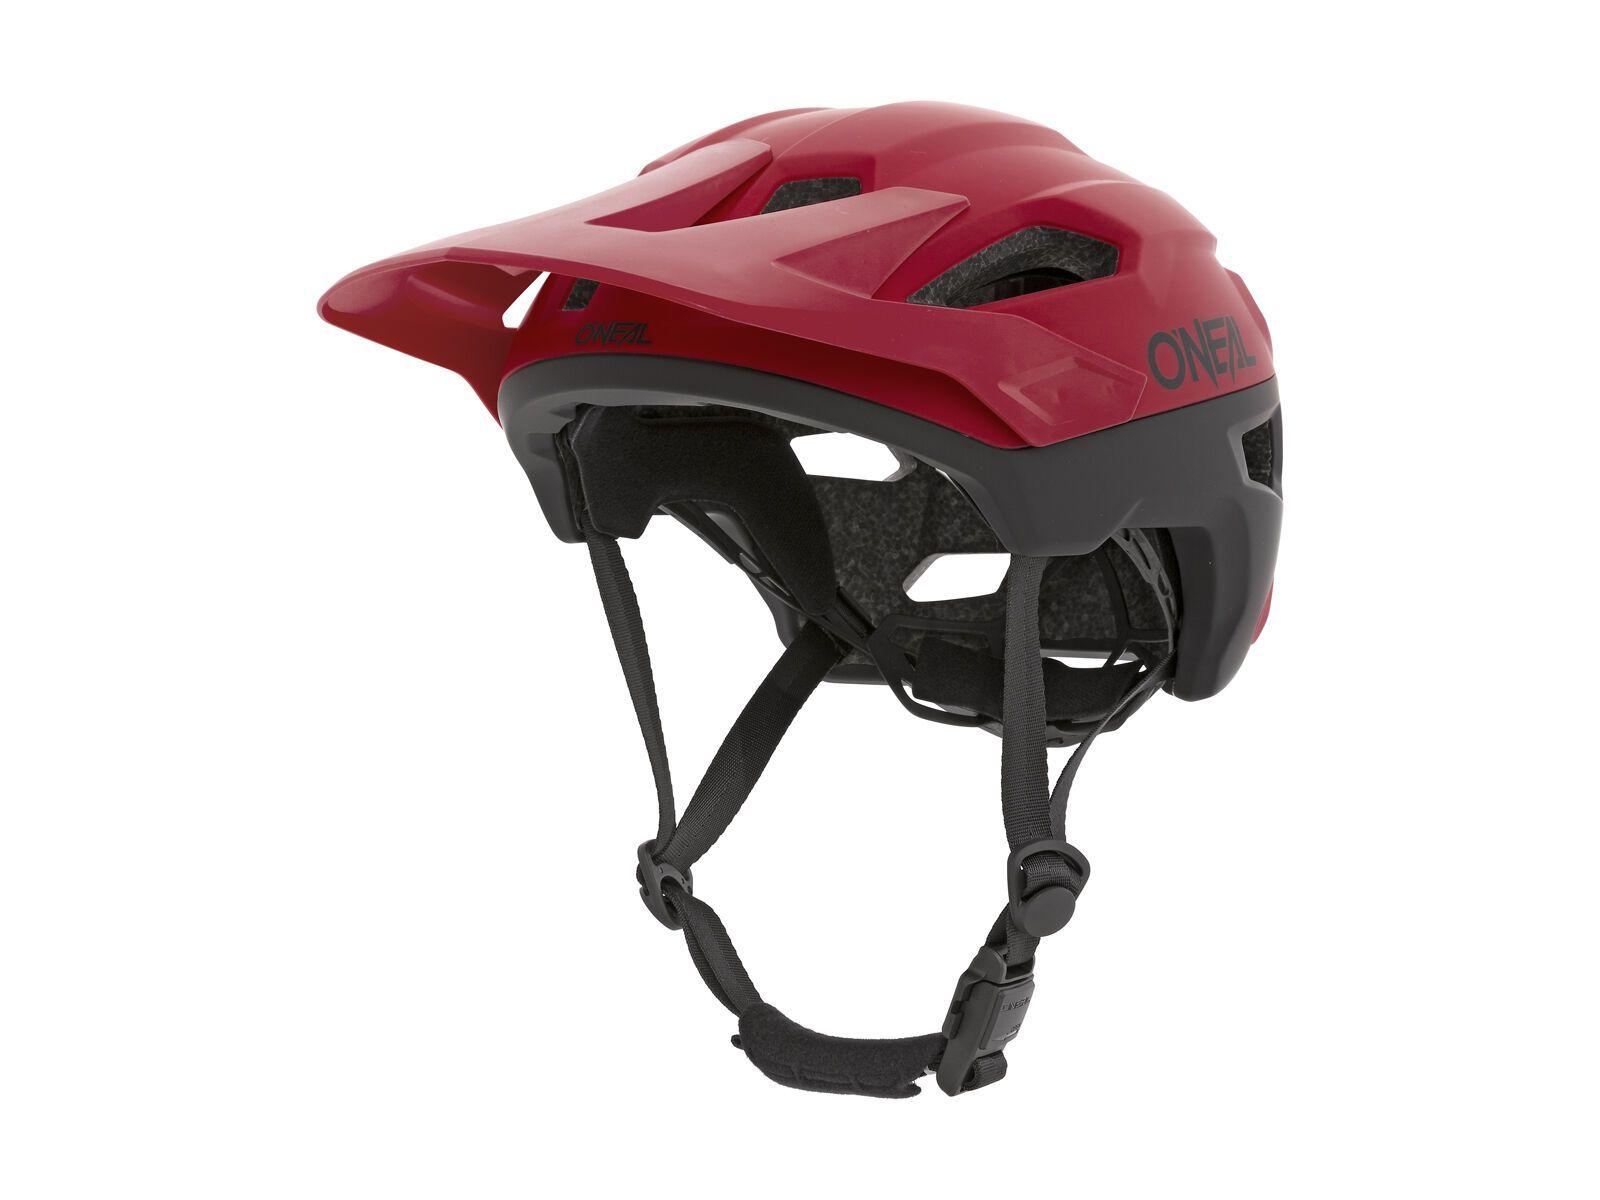 ONeal Trailfinder Helmet Split red S/M // 54-58 cm 0013-302